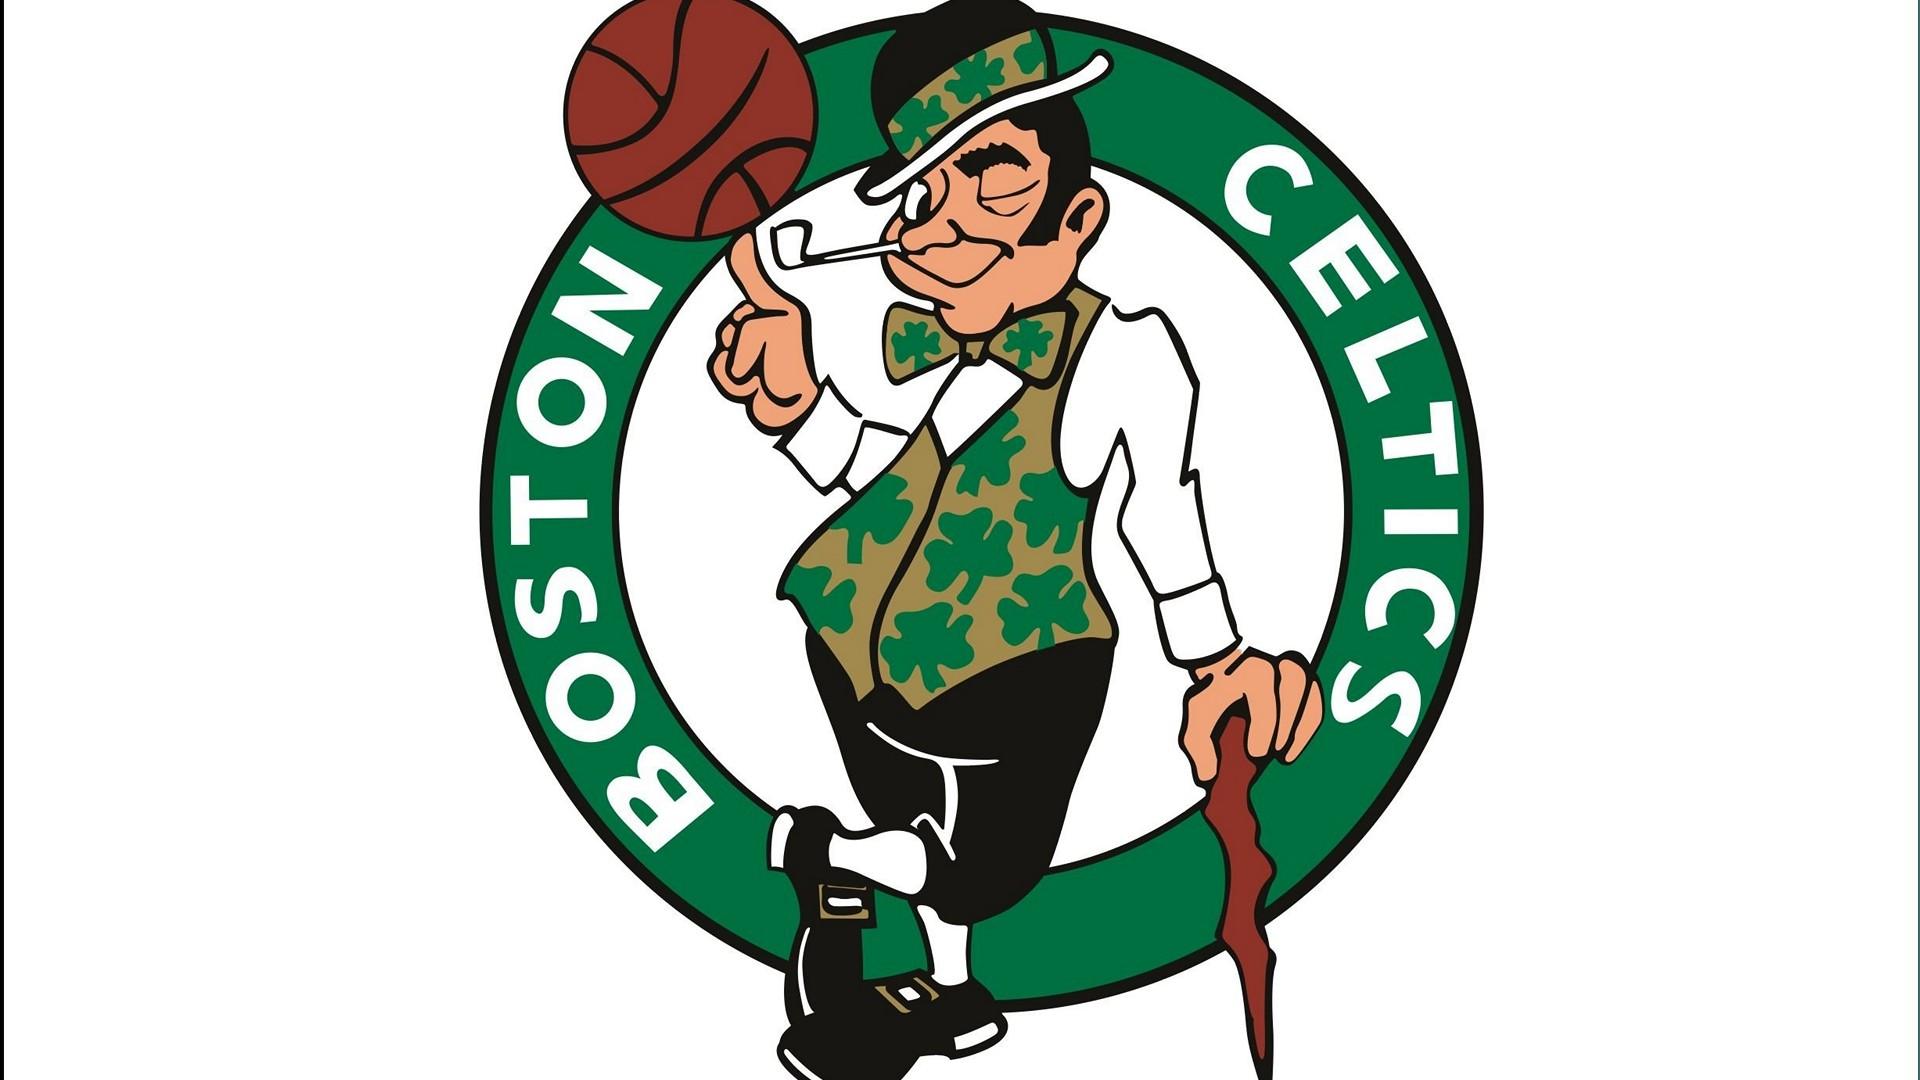 Boston Celtics Wallpapers Hd Wallpapers 1920x1080